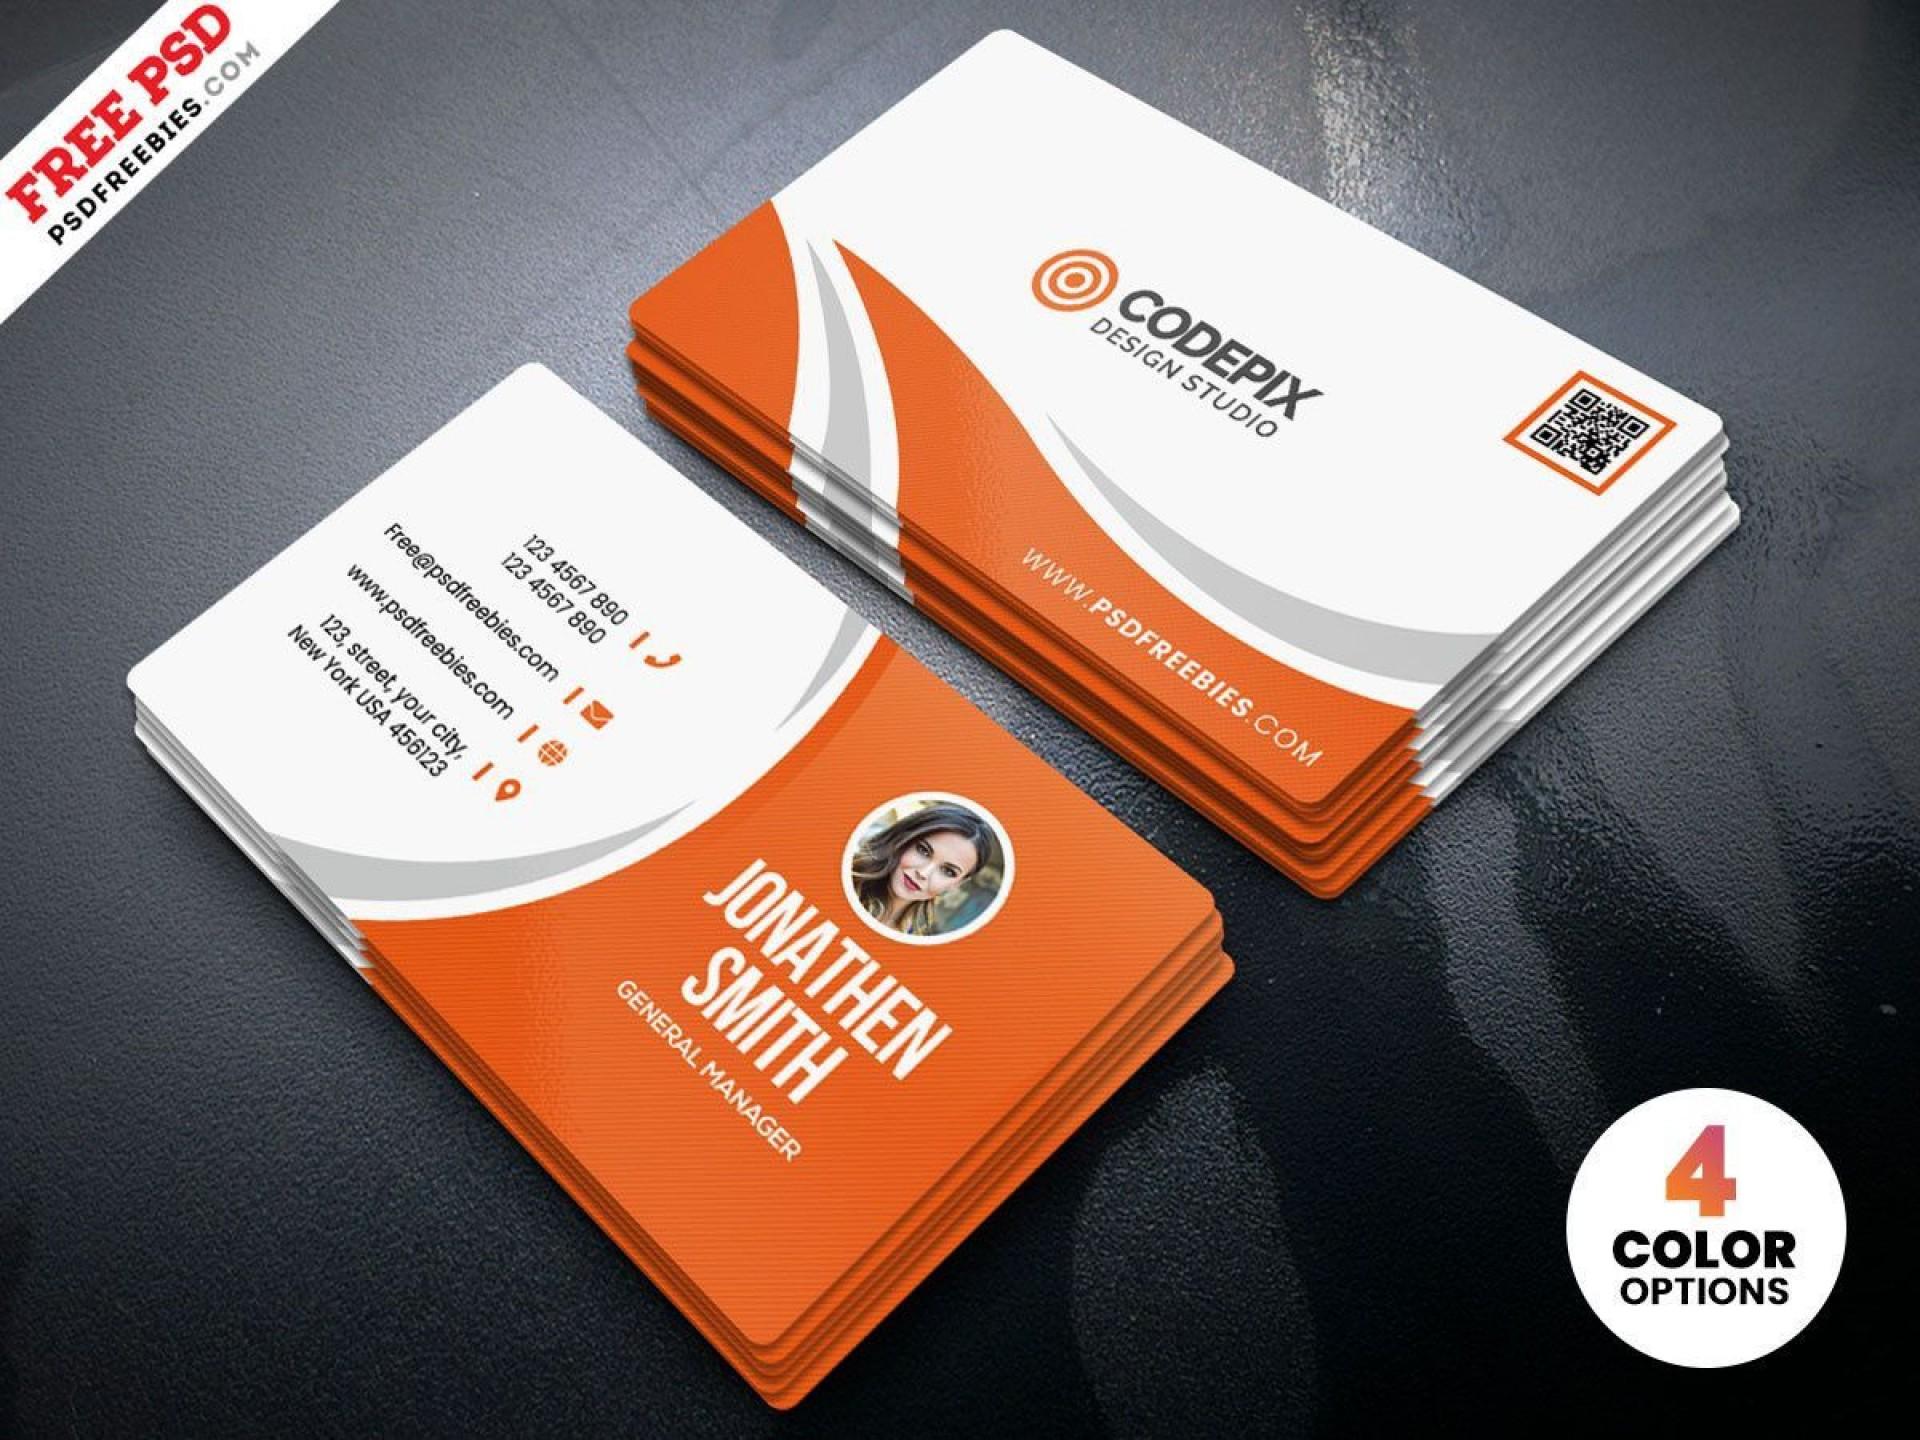 003 Singular Simple Busines Card Template Free Highest Quality  Visiting Design Psd File Download Minimalist Basic1920